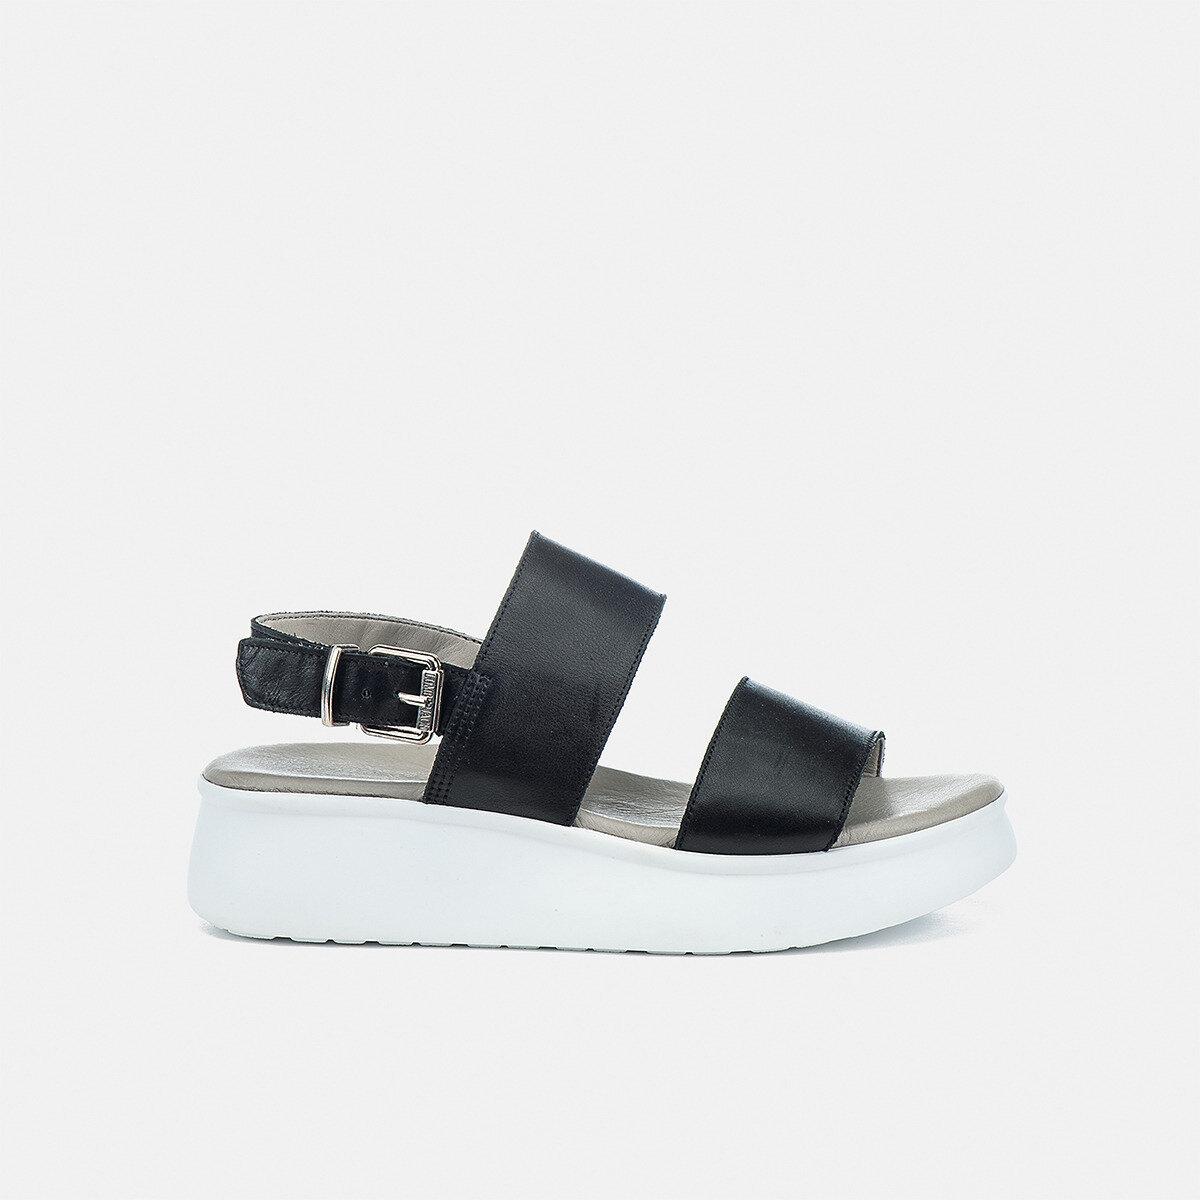 WENDY BLACK Woman Sandals